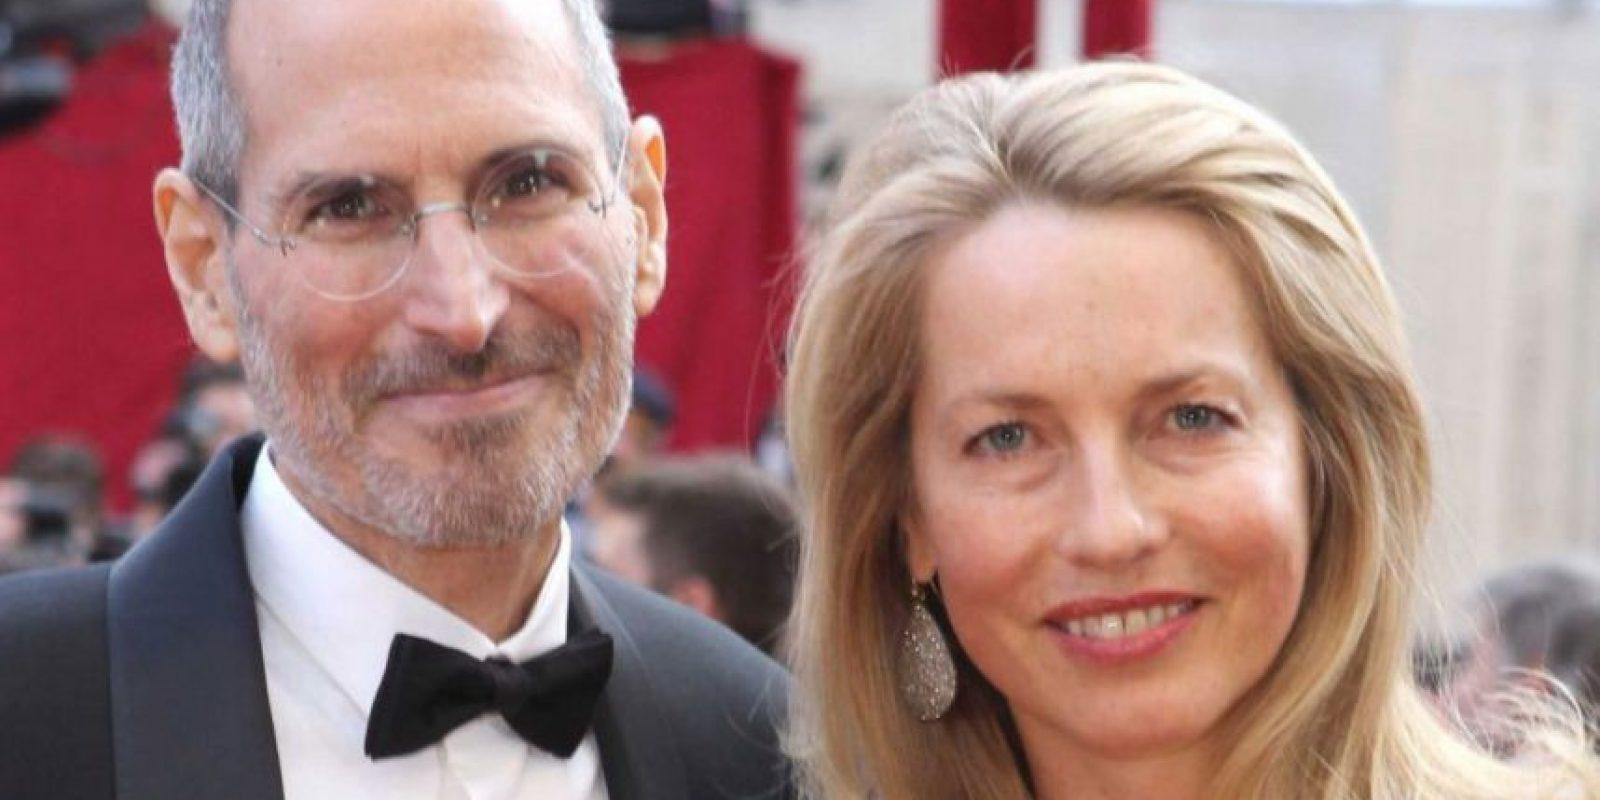 Salió a la luz que Laurene Powell Jobs, la viuda de Steve Jobs, quiso cancelar la nueva película de Fassbender sobre su marido Foto:Universal Pictures